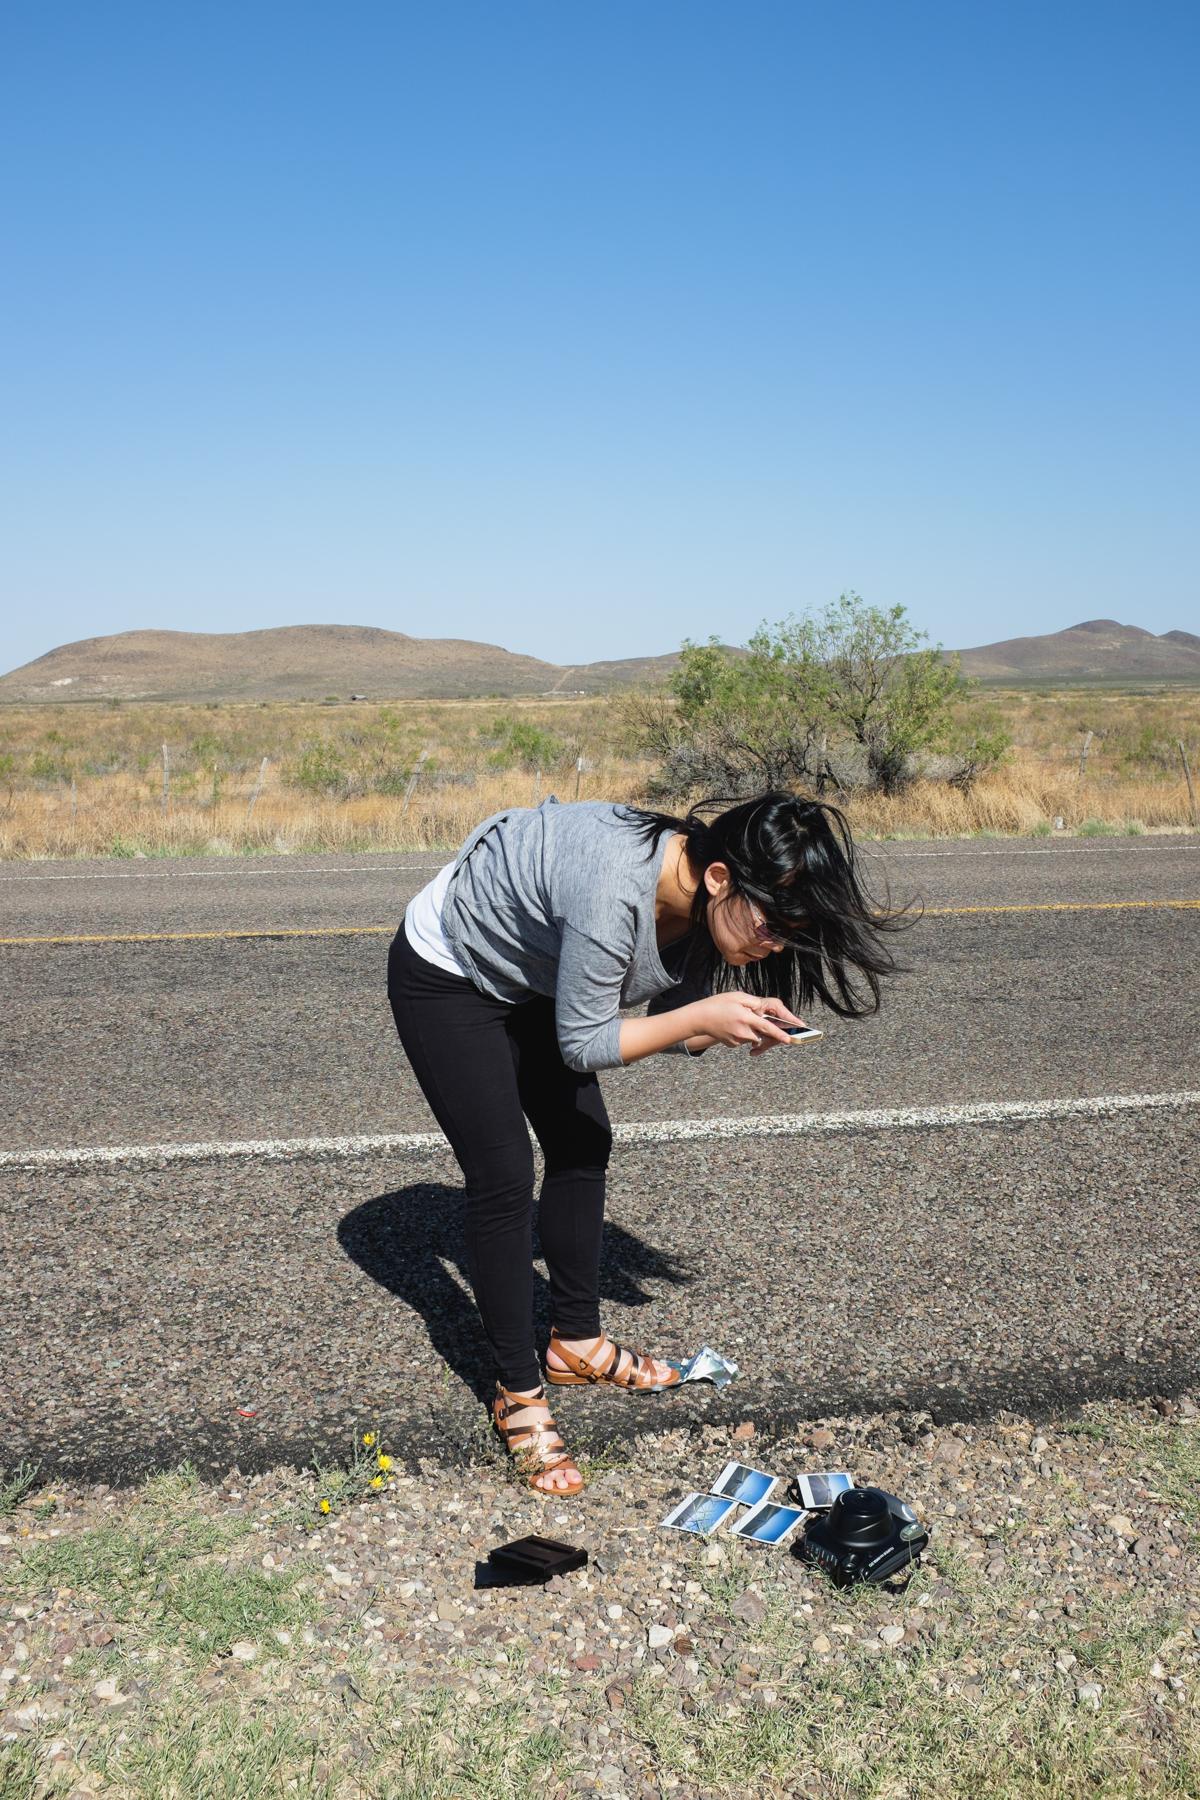 Marfa_TX_EL_COSMICO-SOHOSTORY-Roadtrip-Day2-020.jpg